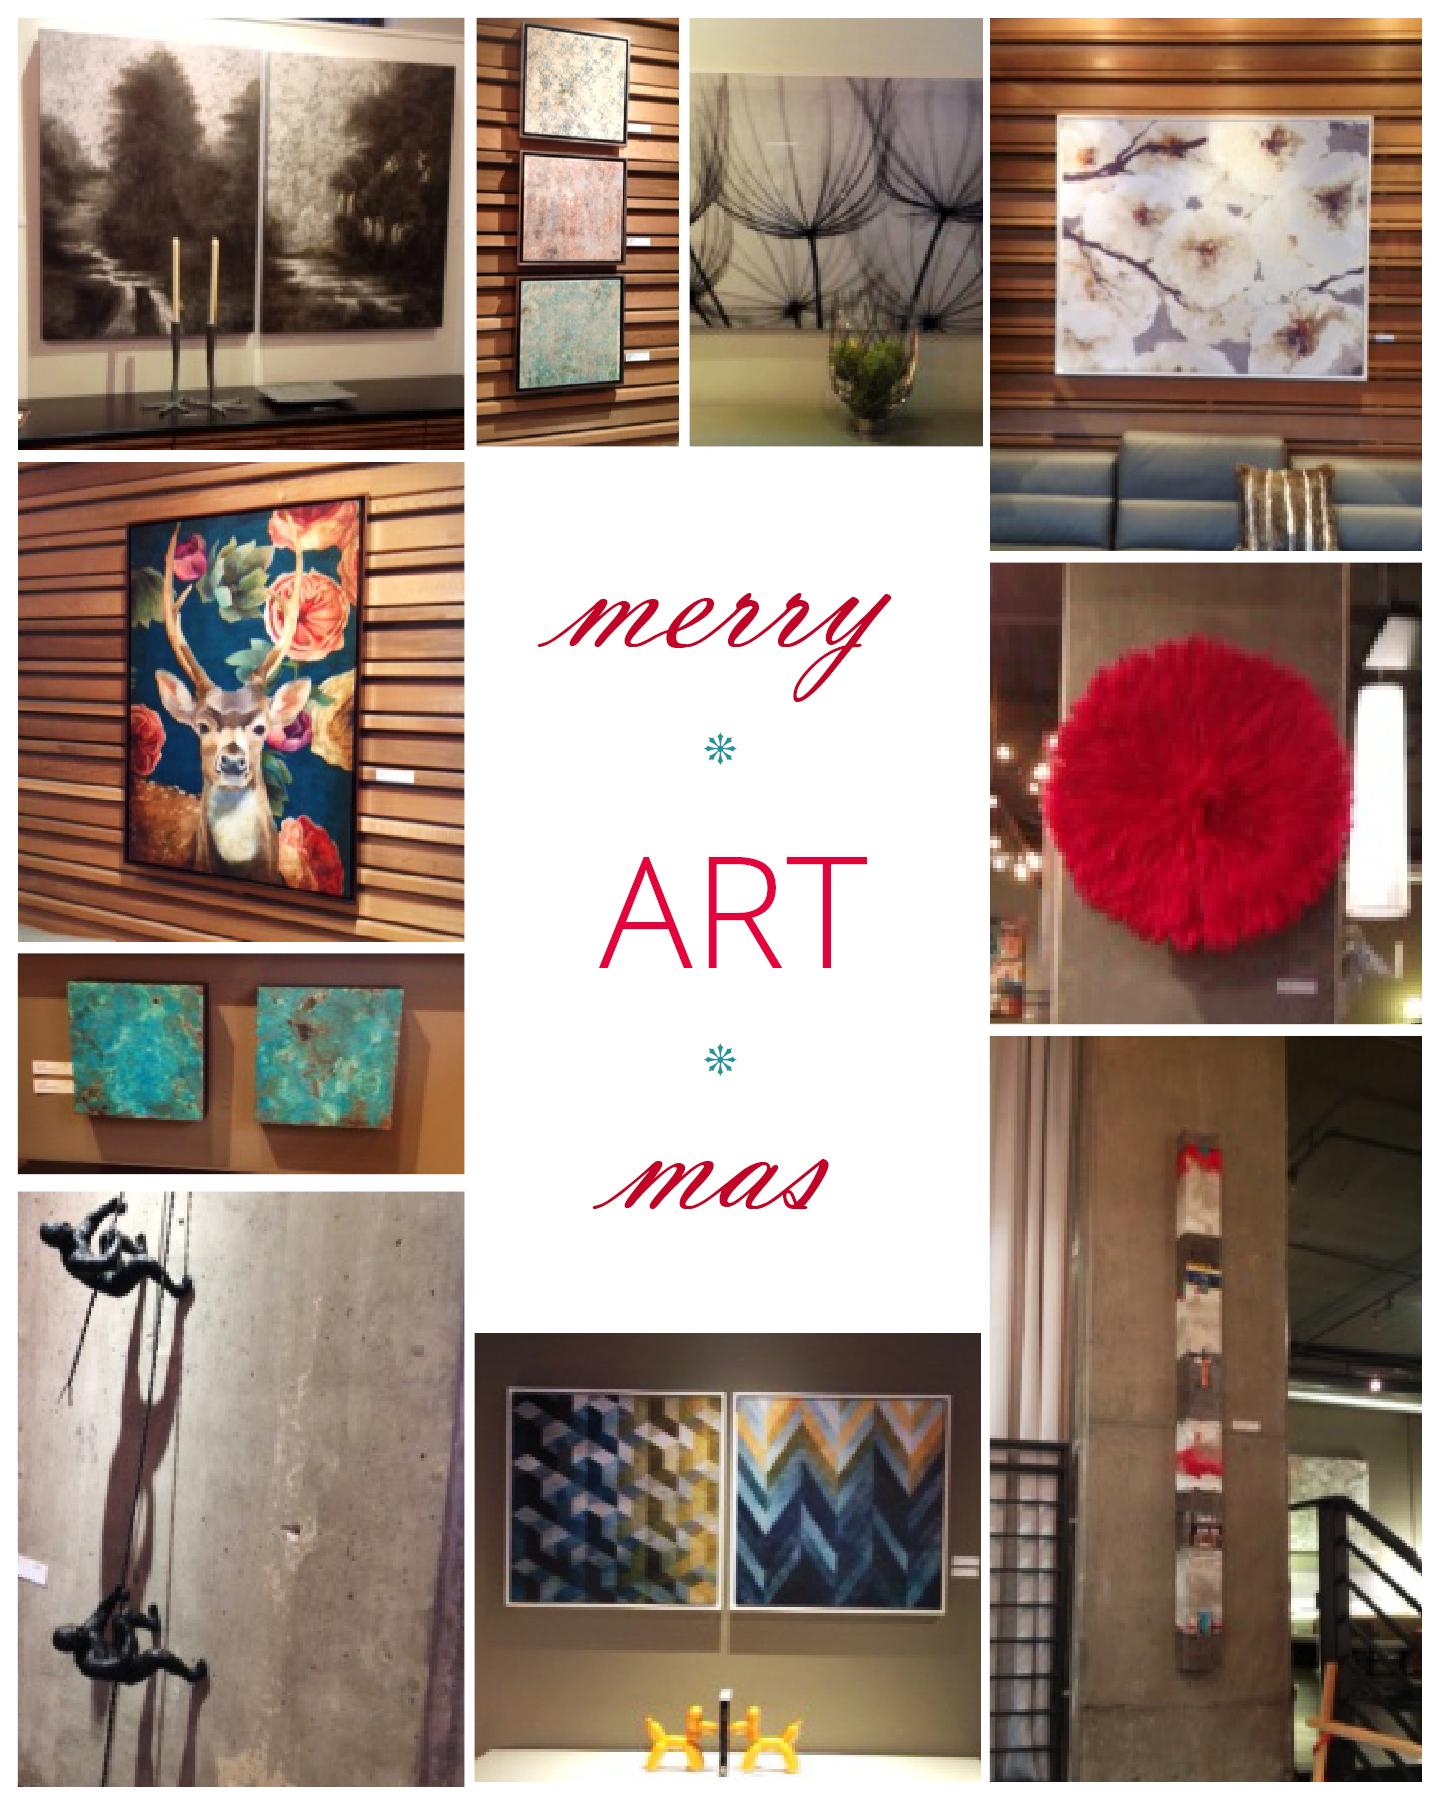 Merry_Art_Mas_EWF